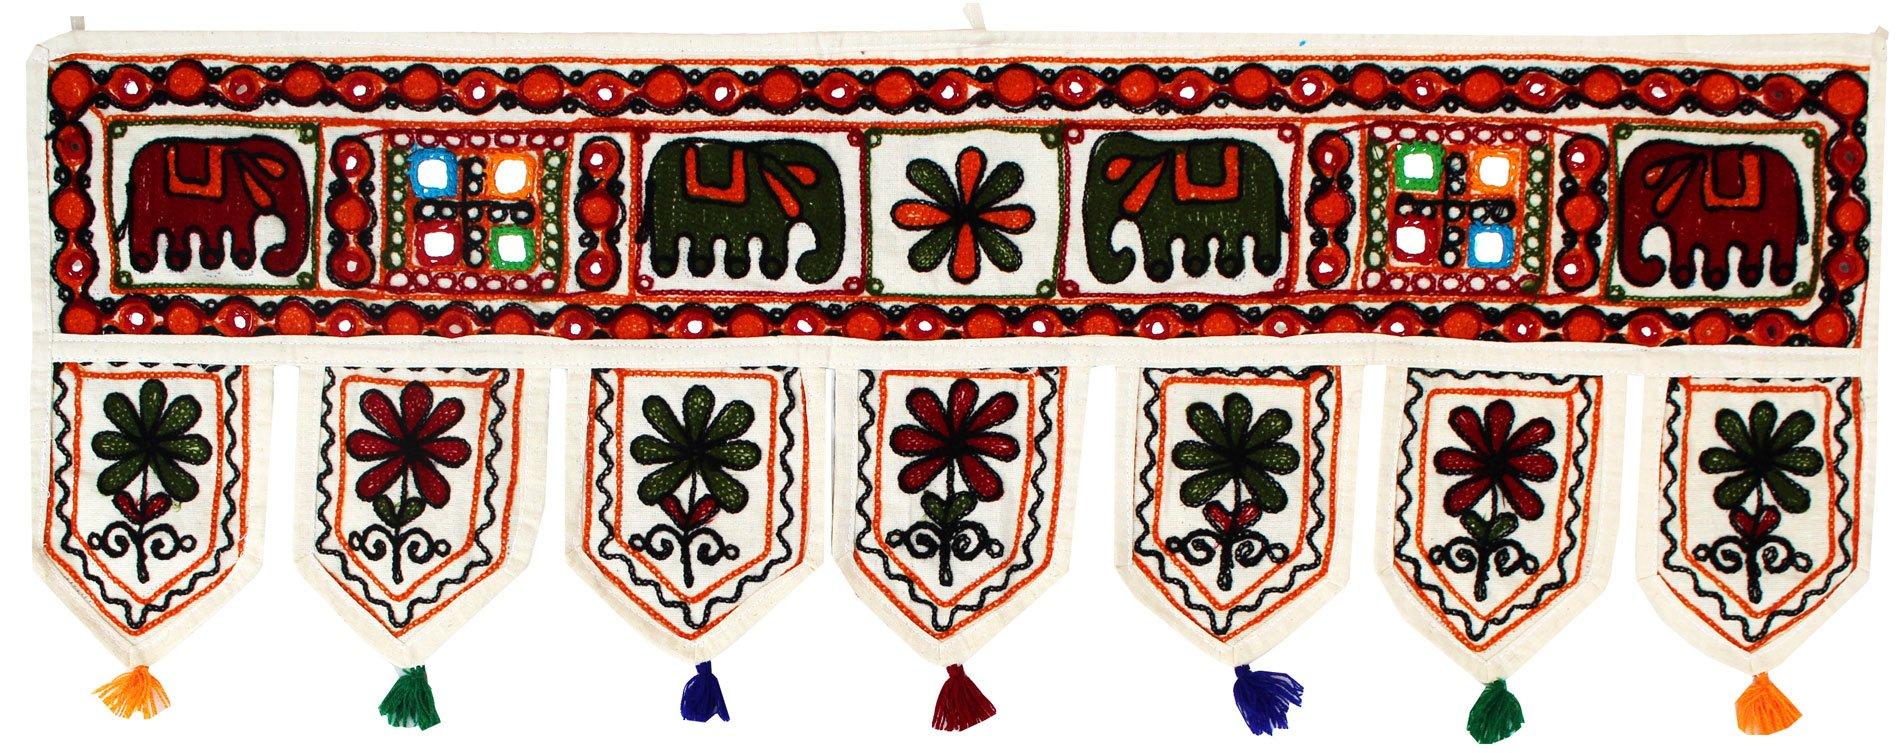 Indian Toran Door Decoration Window Valance Handmade (Off-White, 34 x 13 inches)